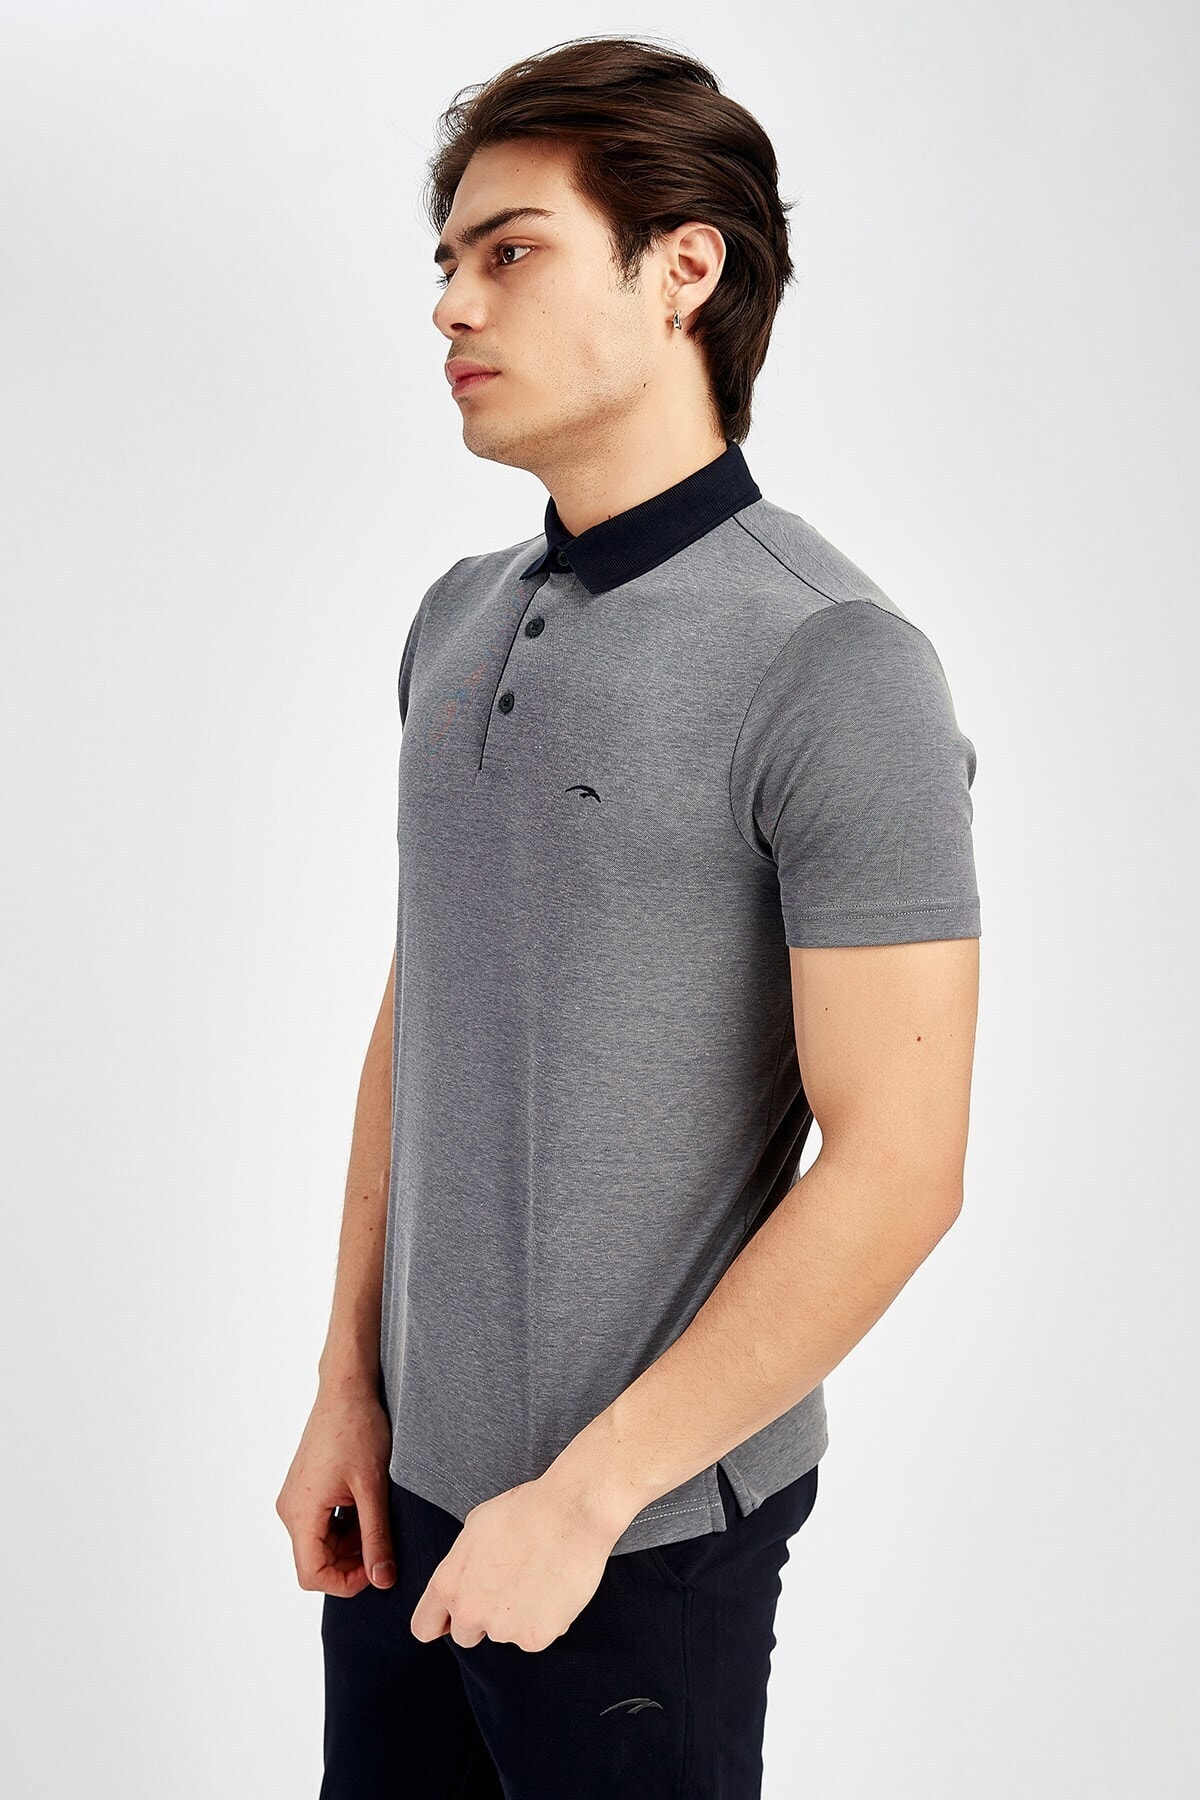 MARATON Erkek Gri Sportswear T-shirt 2